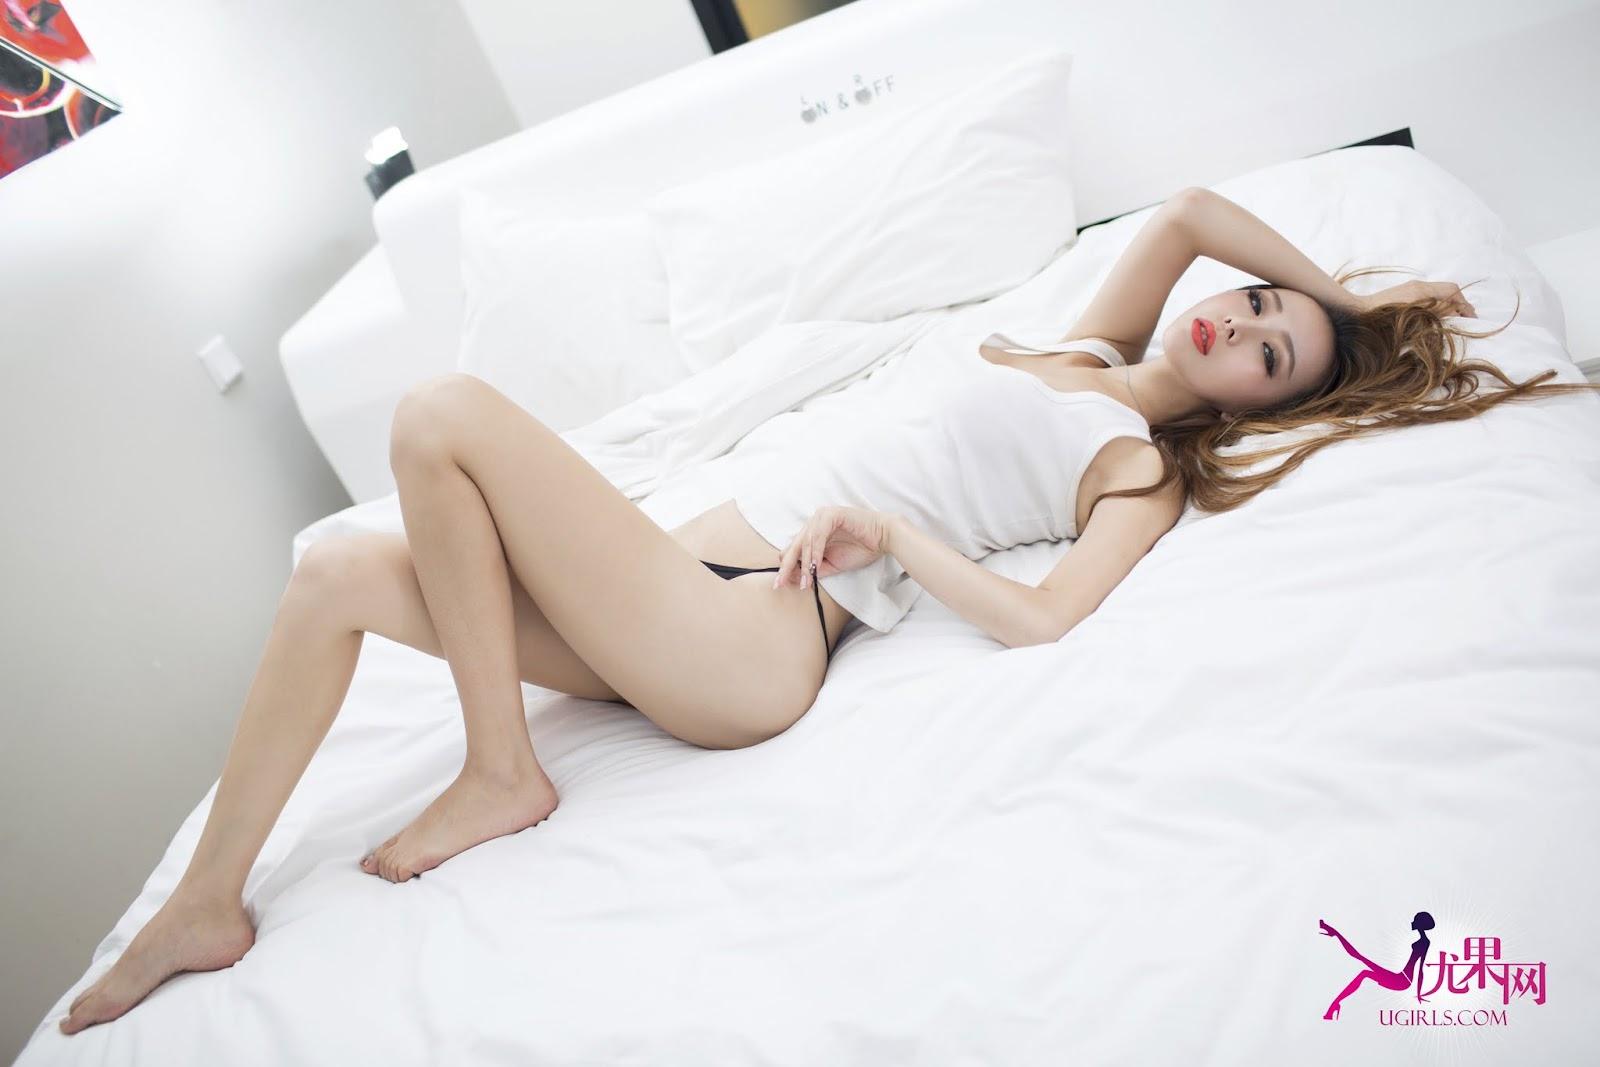 U091%2B%252851%2529 - Sexy Photo UGIRLS NO.91 Nude Girl